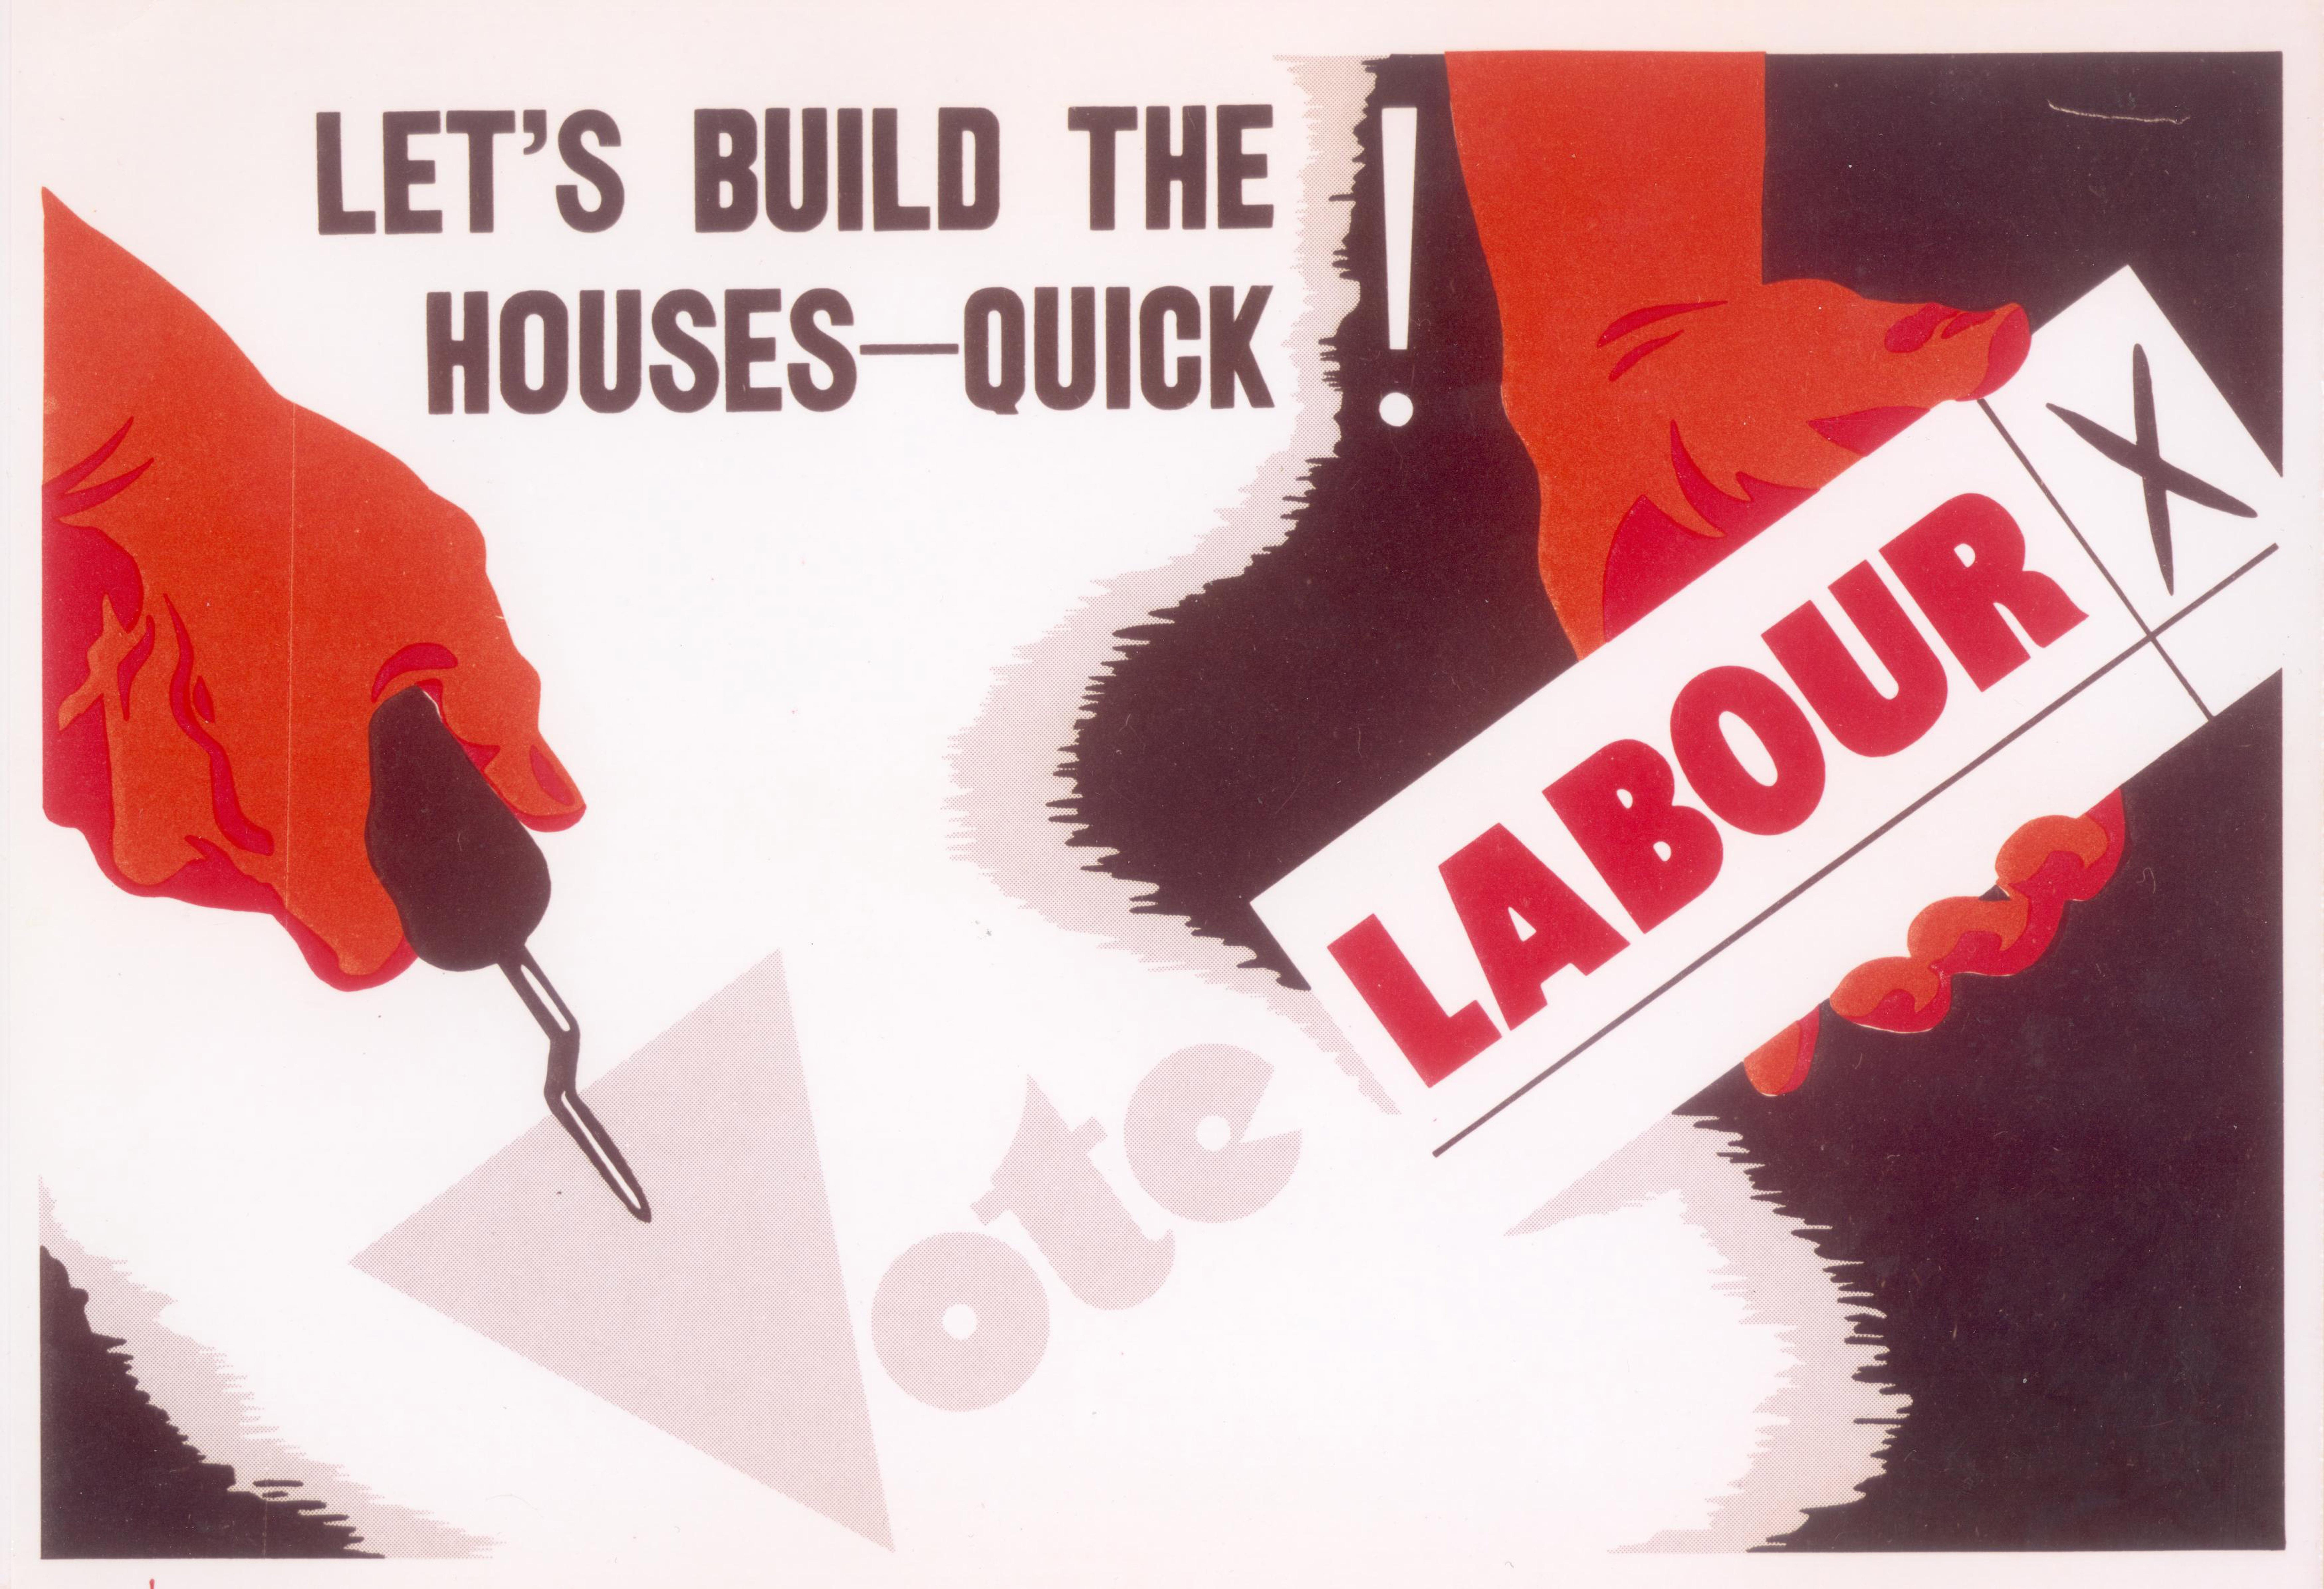 Lets_build_houses_quick.jpg